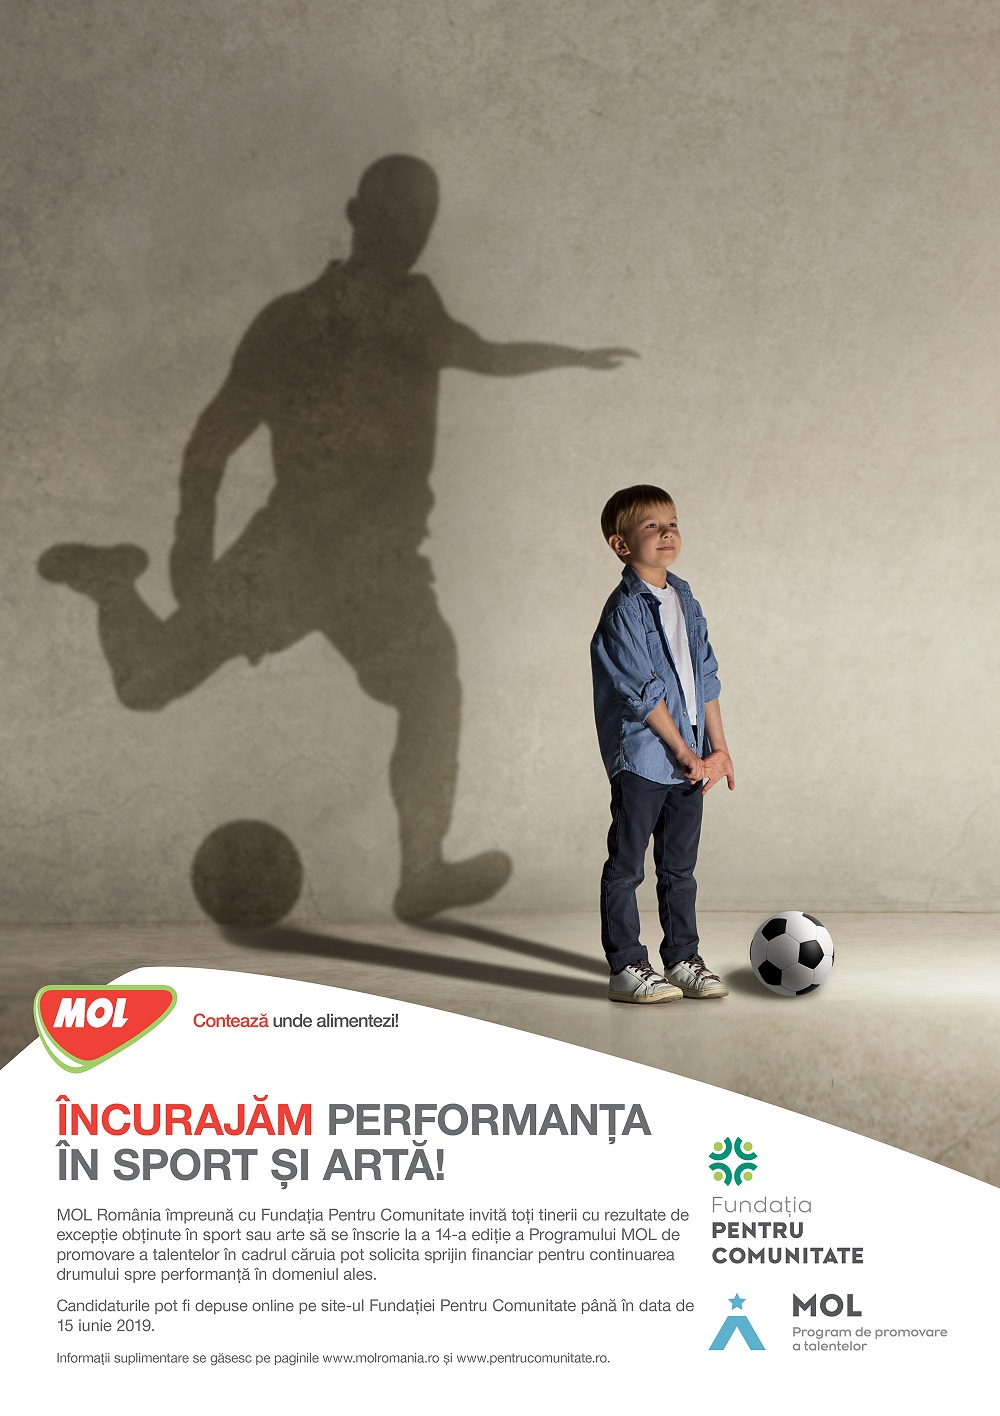 Sprijin financiar acordat tinerilor sportivi È™i artiÈ™ti prin Programul MOL